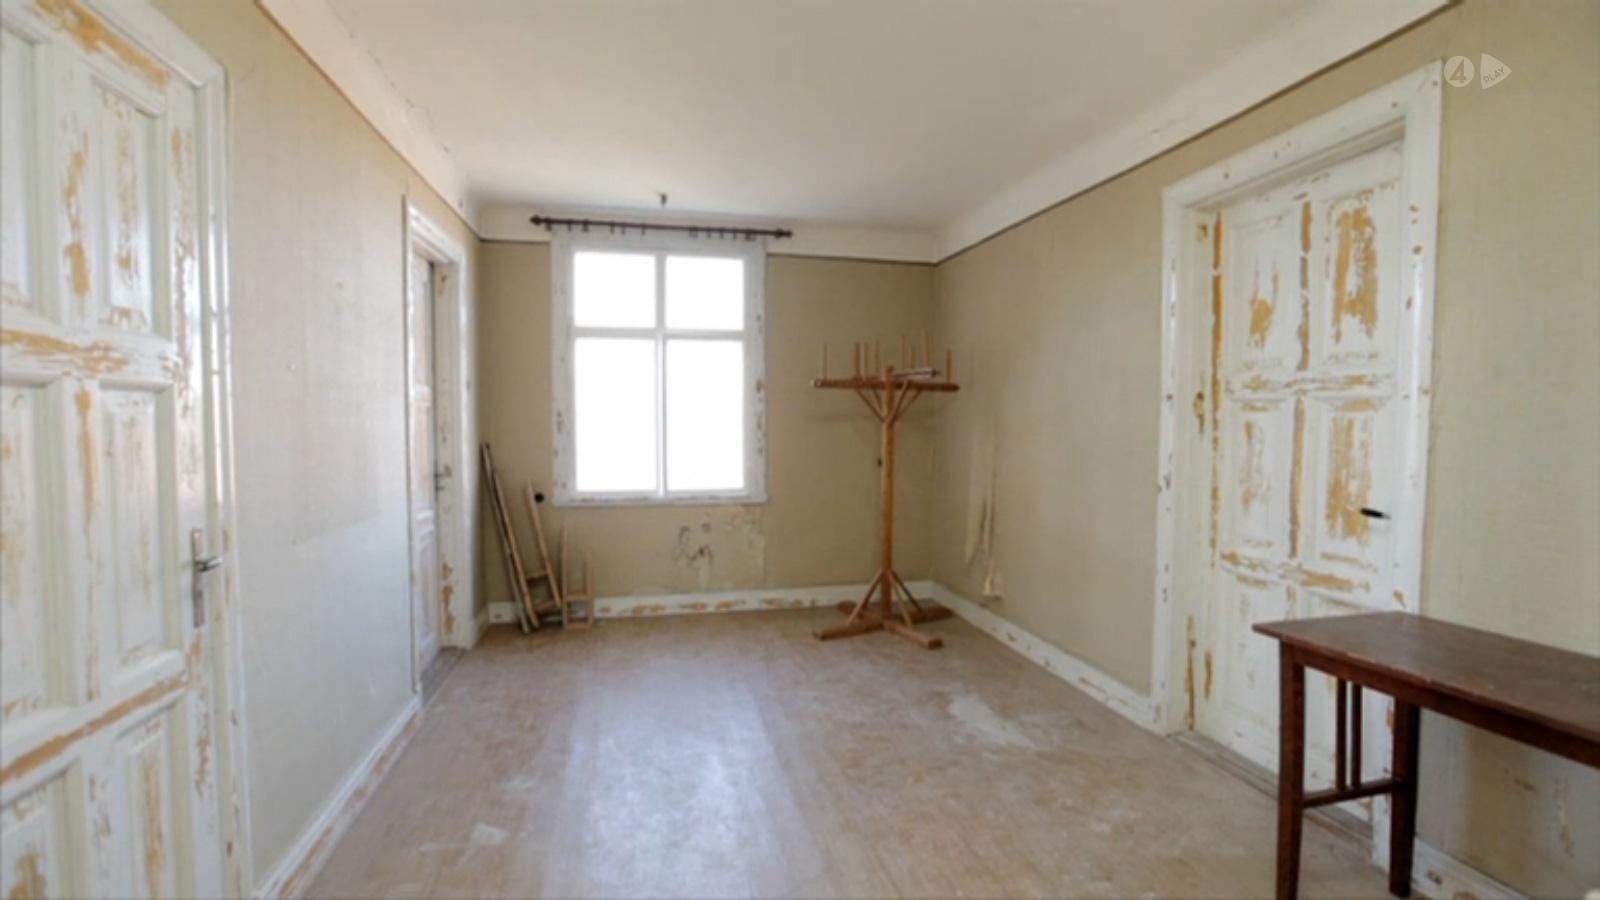 sommar-med-ernst_badrum-före-renovering_kolmårdsmarmor_badrum-inspiration_badrumsdrömmar